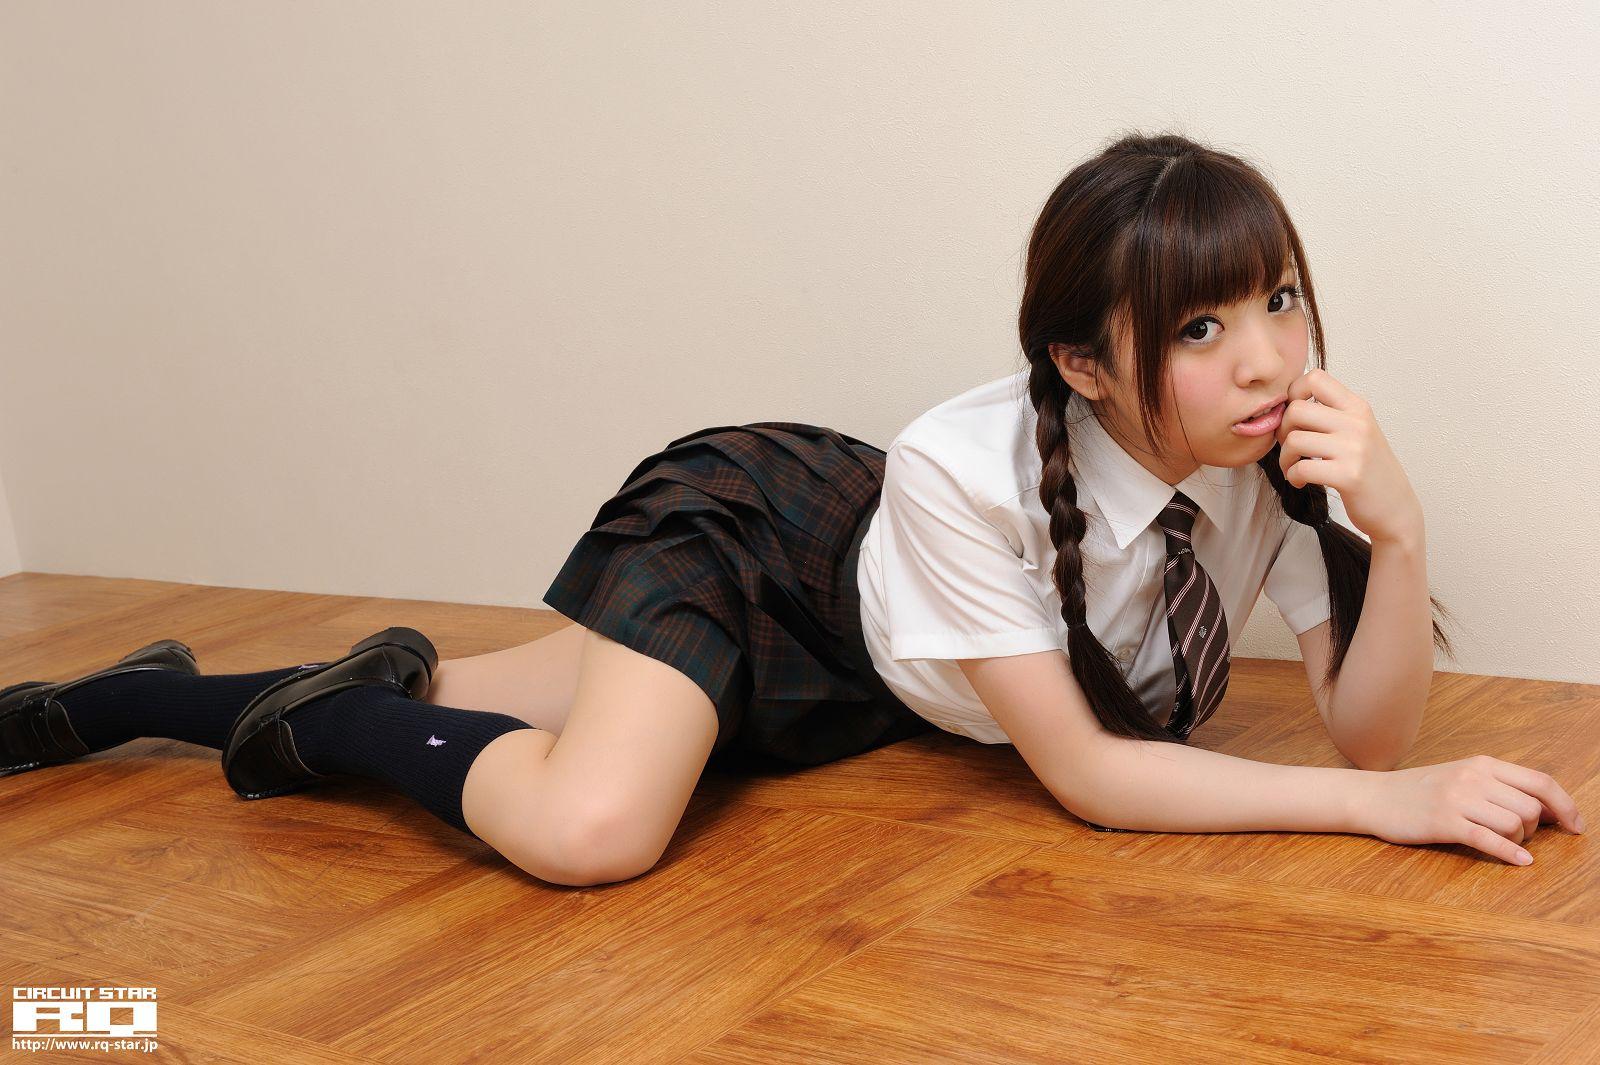 [RQ STAR美女] NO.00515 Mayuka Kuroda 锿蚪Y花 Student Style[111P] RQ STAR 第3张